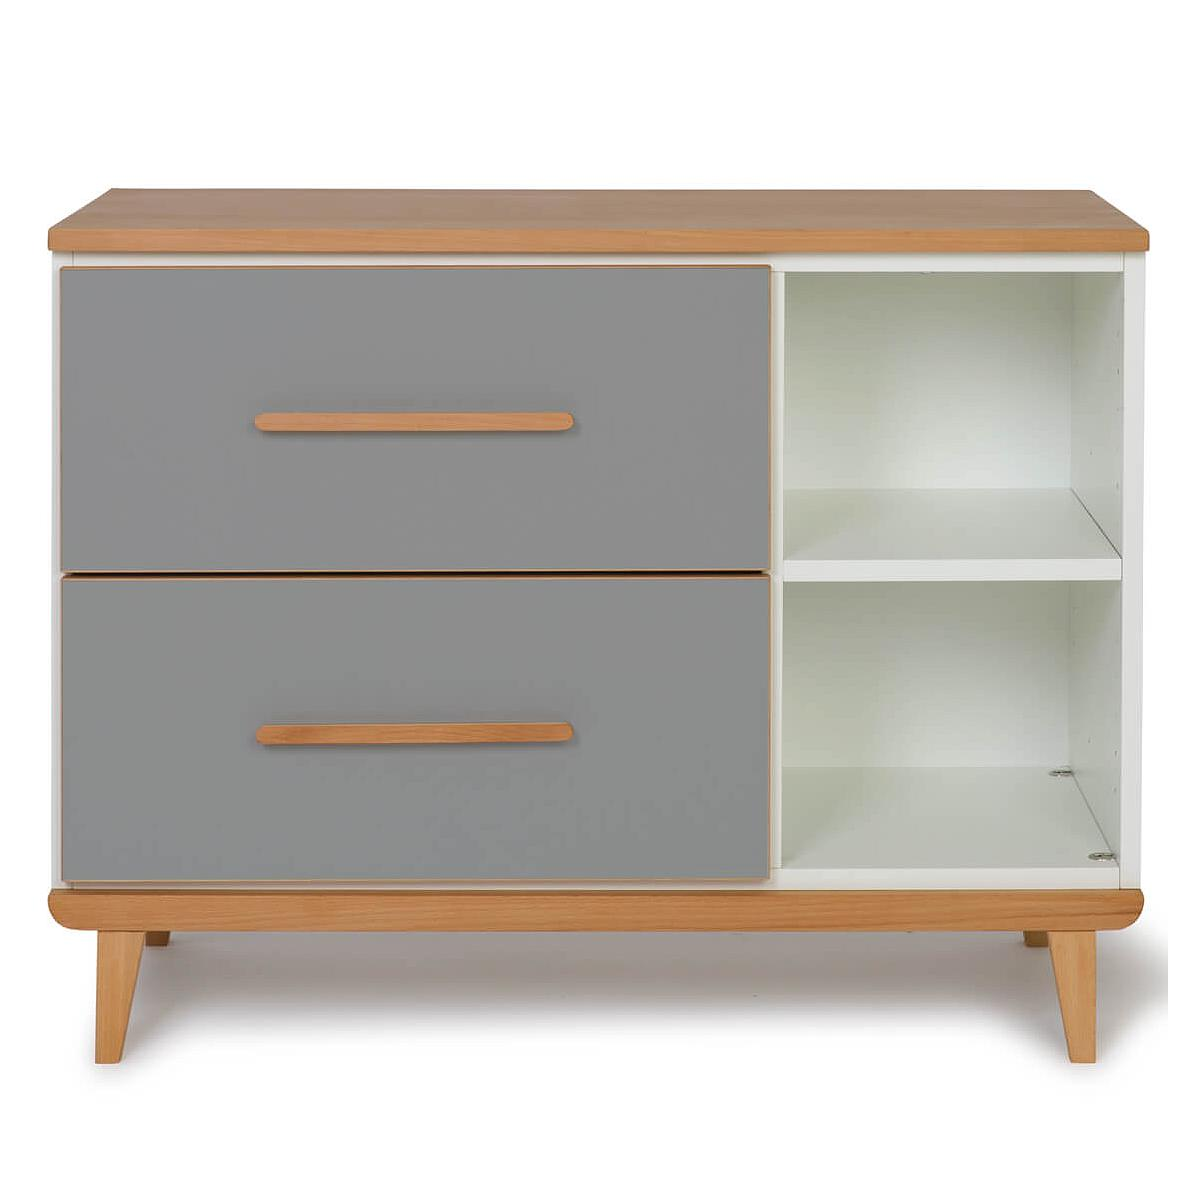 Wookids - Petit meuble 2 tiroirs NADO slate grey